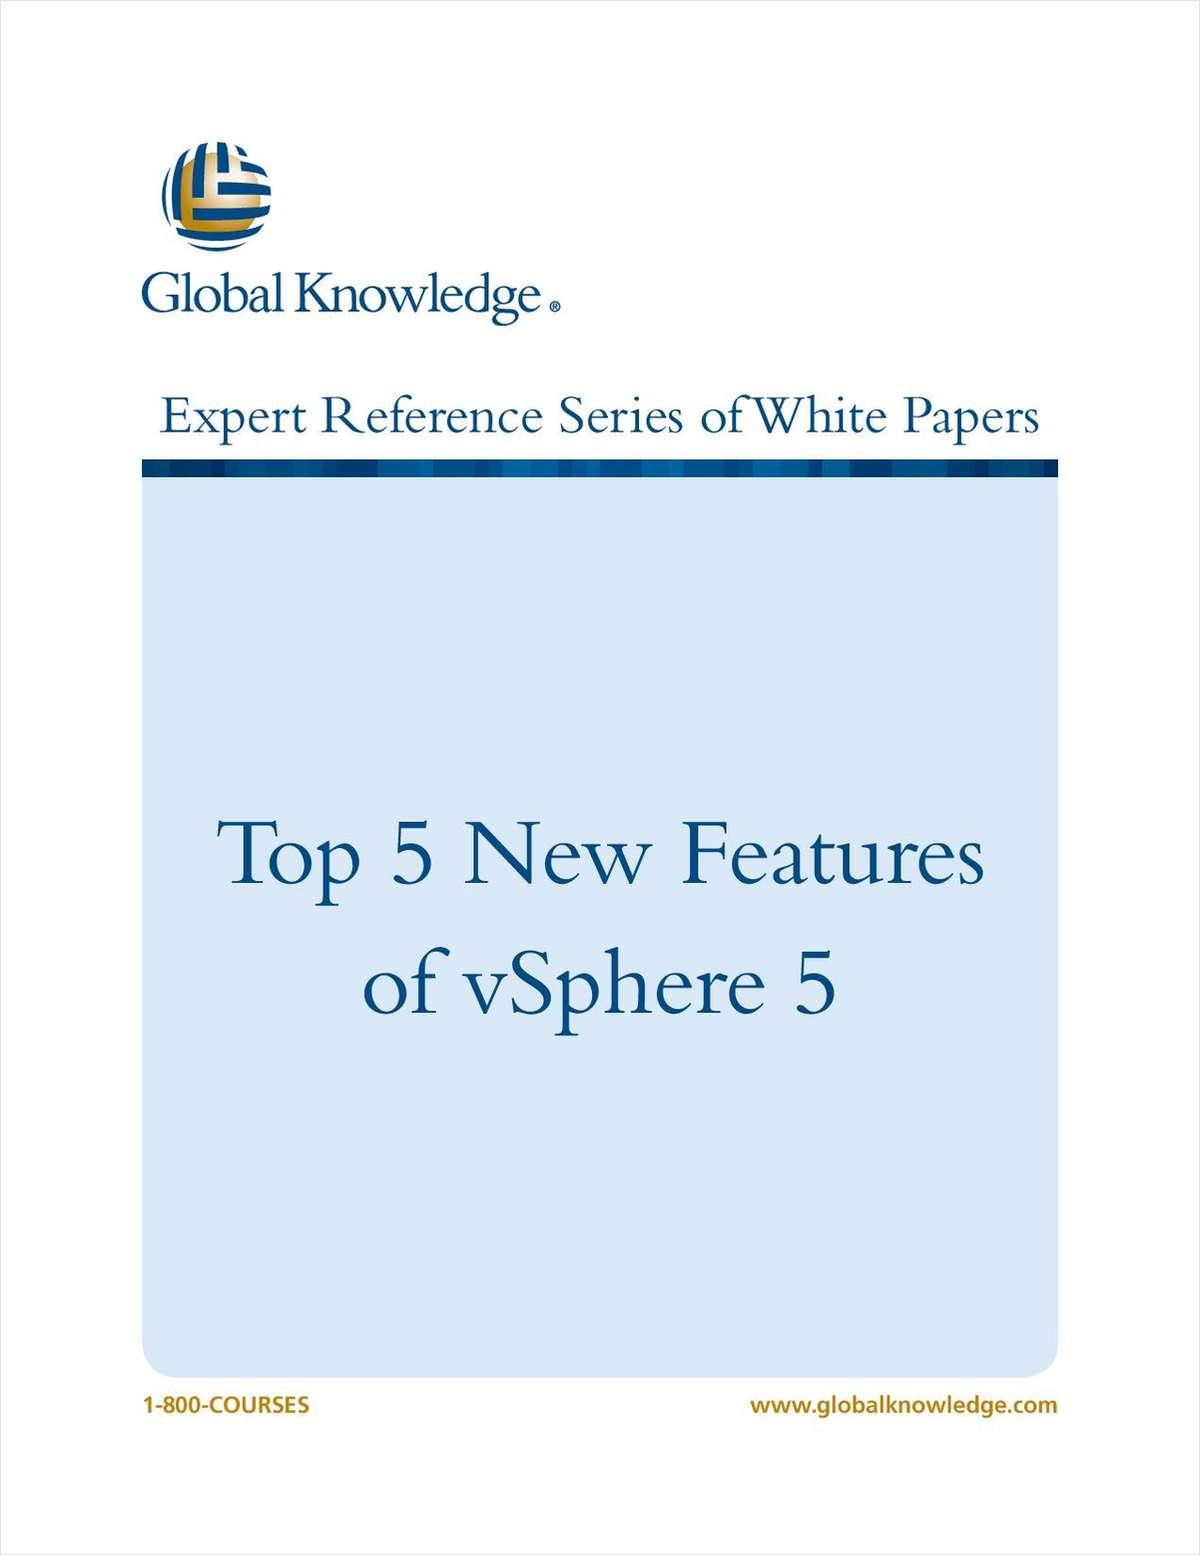 Top 5 New Features of vSphere 5